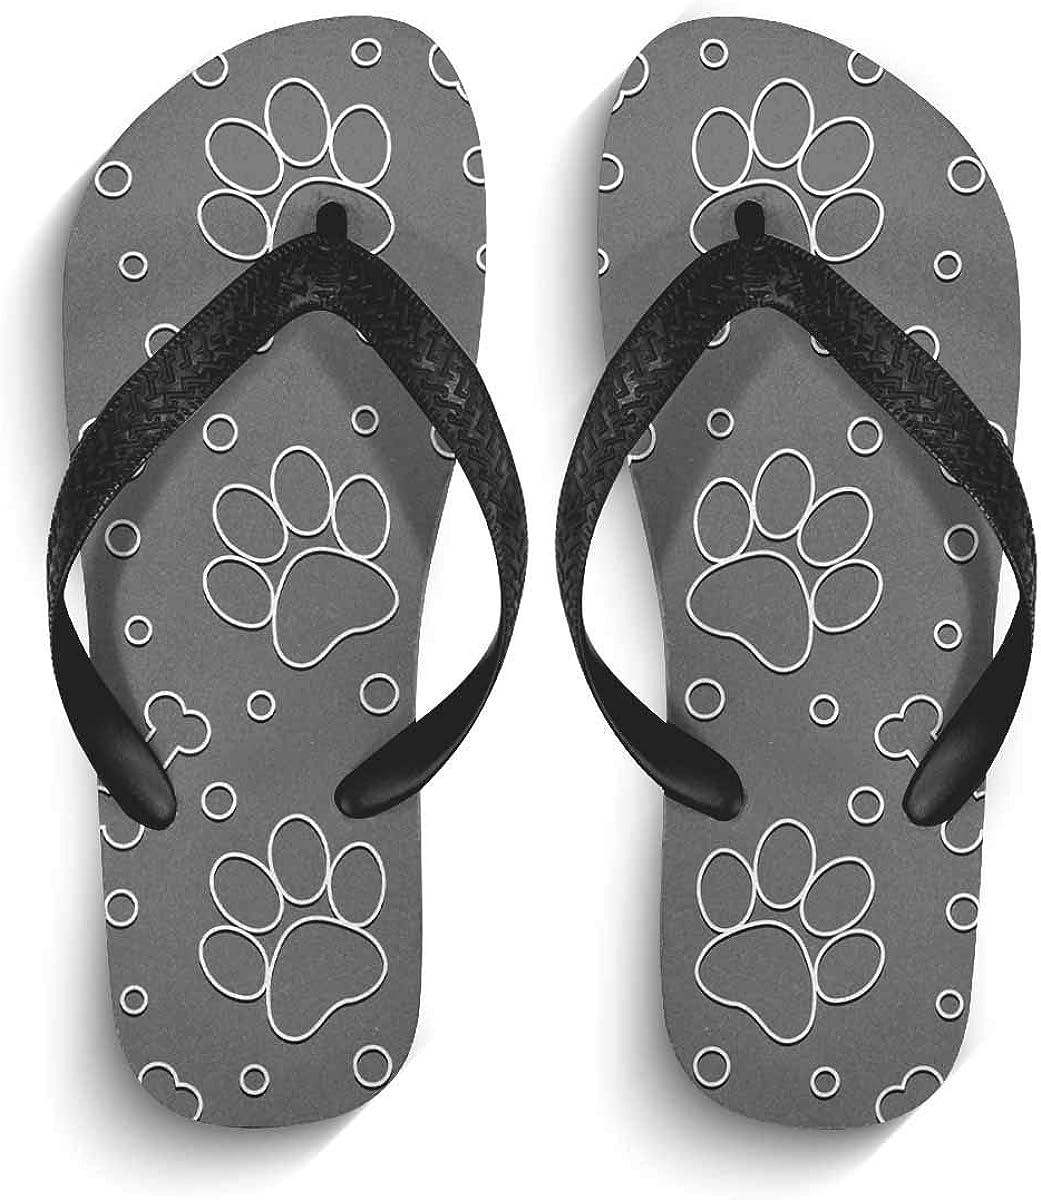 InterestPrint Men's Non-Slip Flip Flops Cute Paw Pattern Thongs Sandals for Beach Lounging Home S